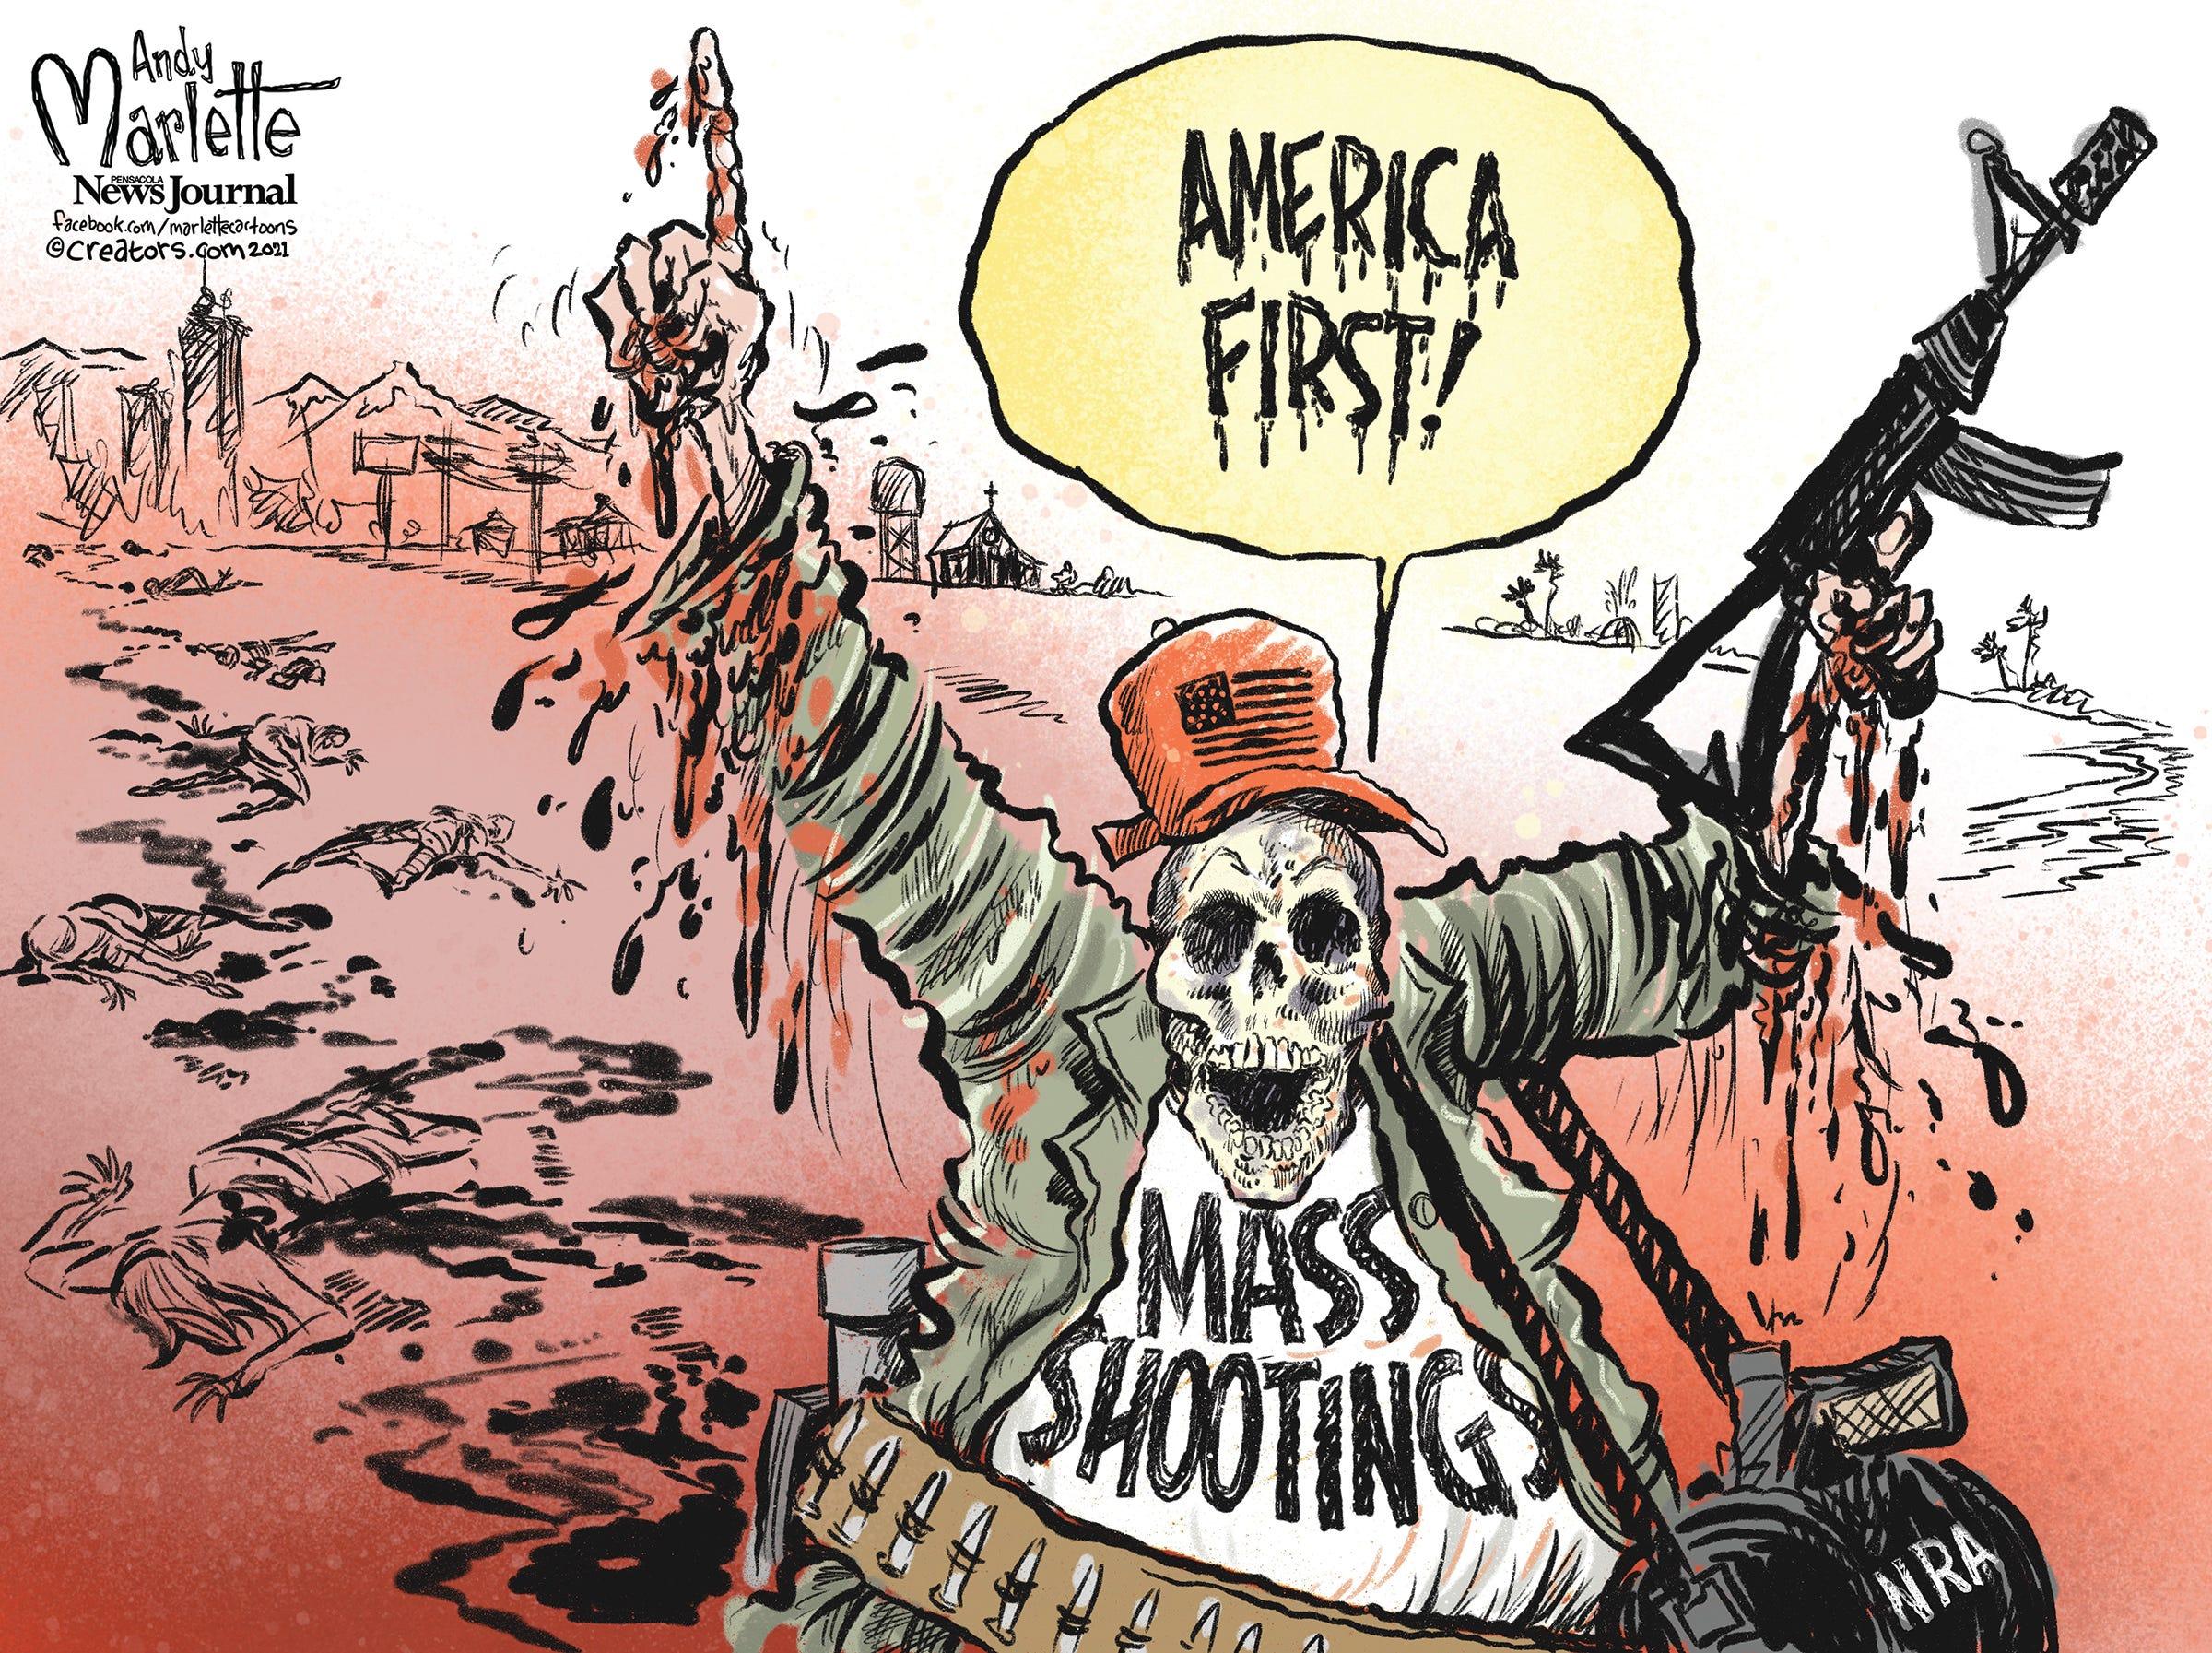 Marlette cartoon: America First! (in mass shootings)